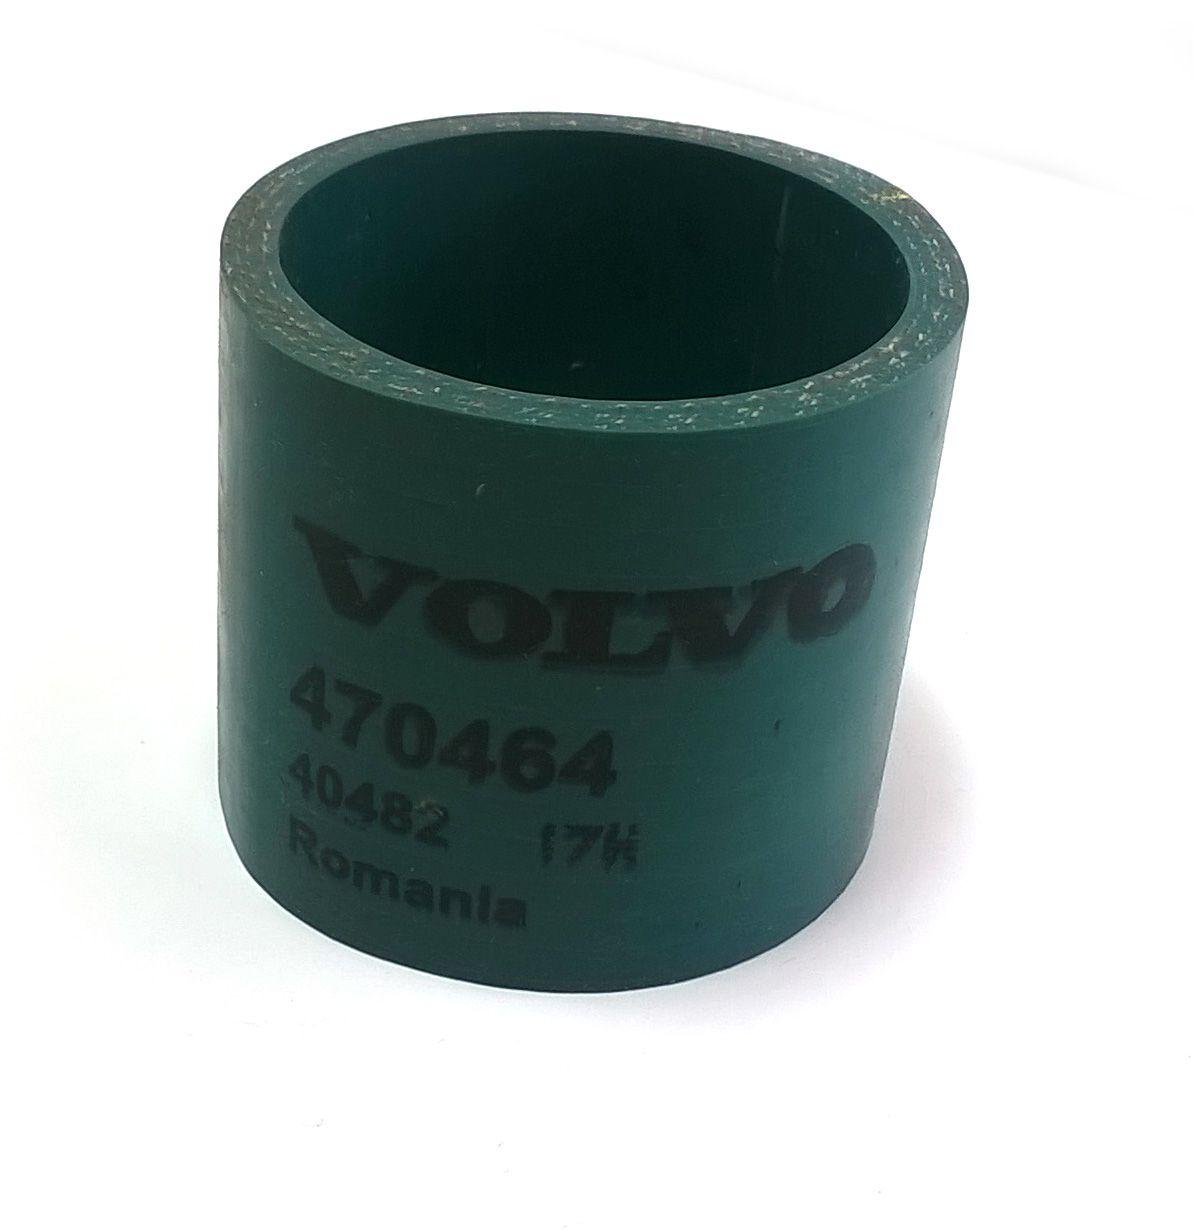 mang tubo carc termost volvo tad1232 - pn 470464